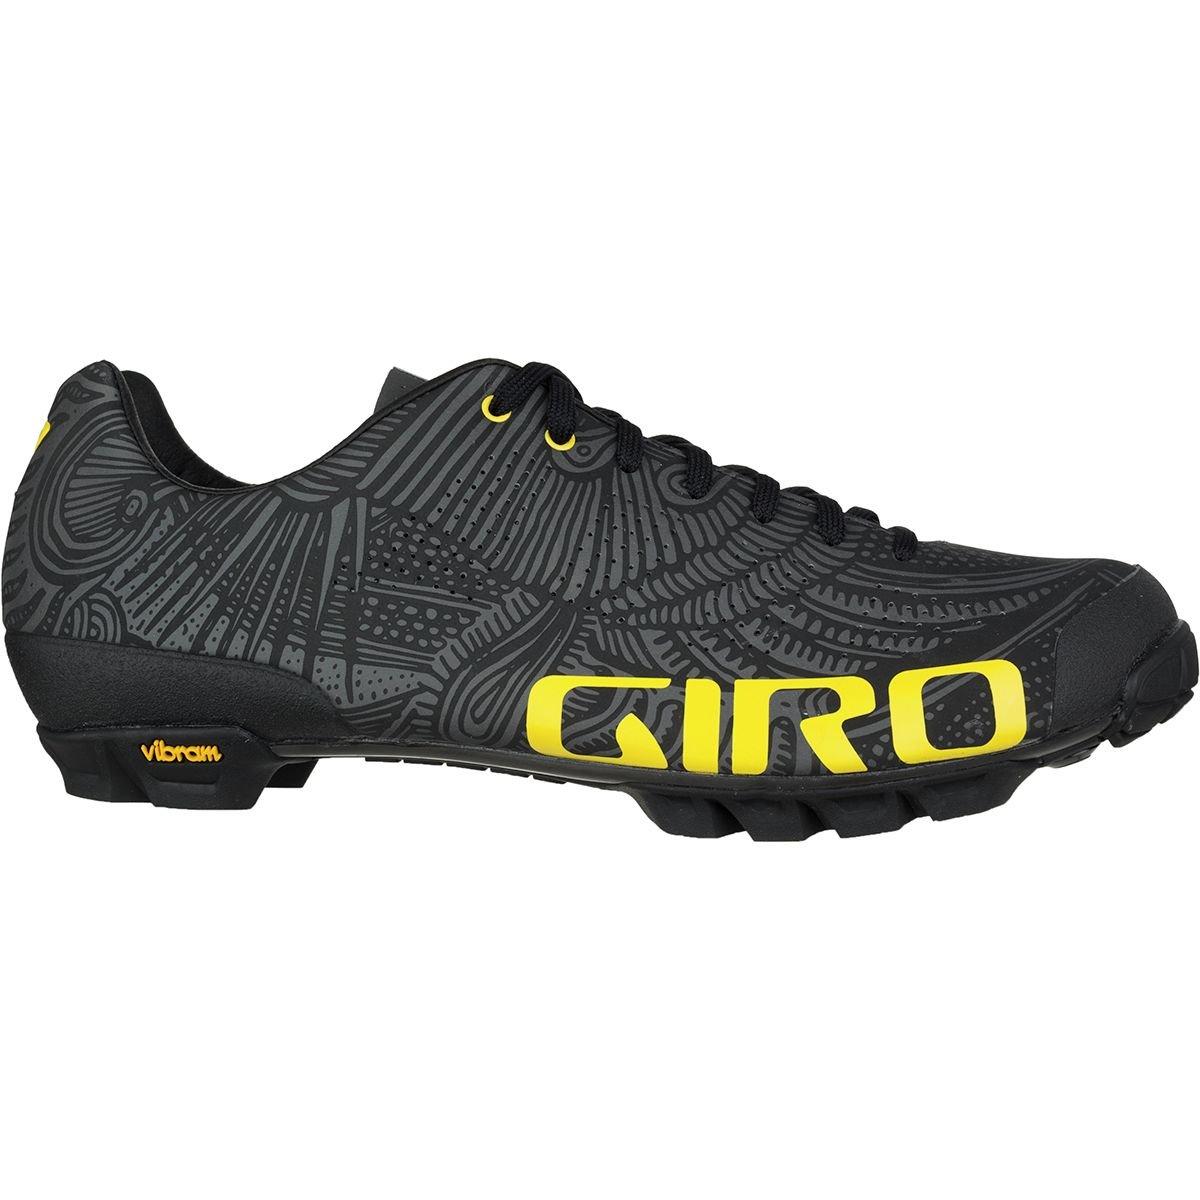 Giro Empire VR90 Arte Sempre Cycling Shoe - Men's B07C9F8FDS 41.5 Dark Shadow Reflective